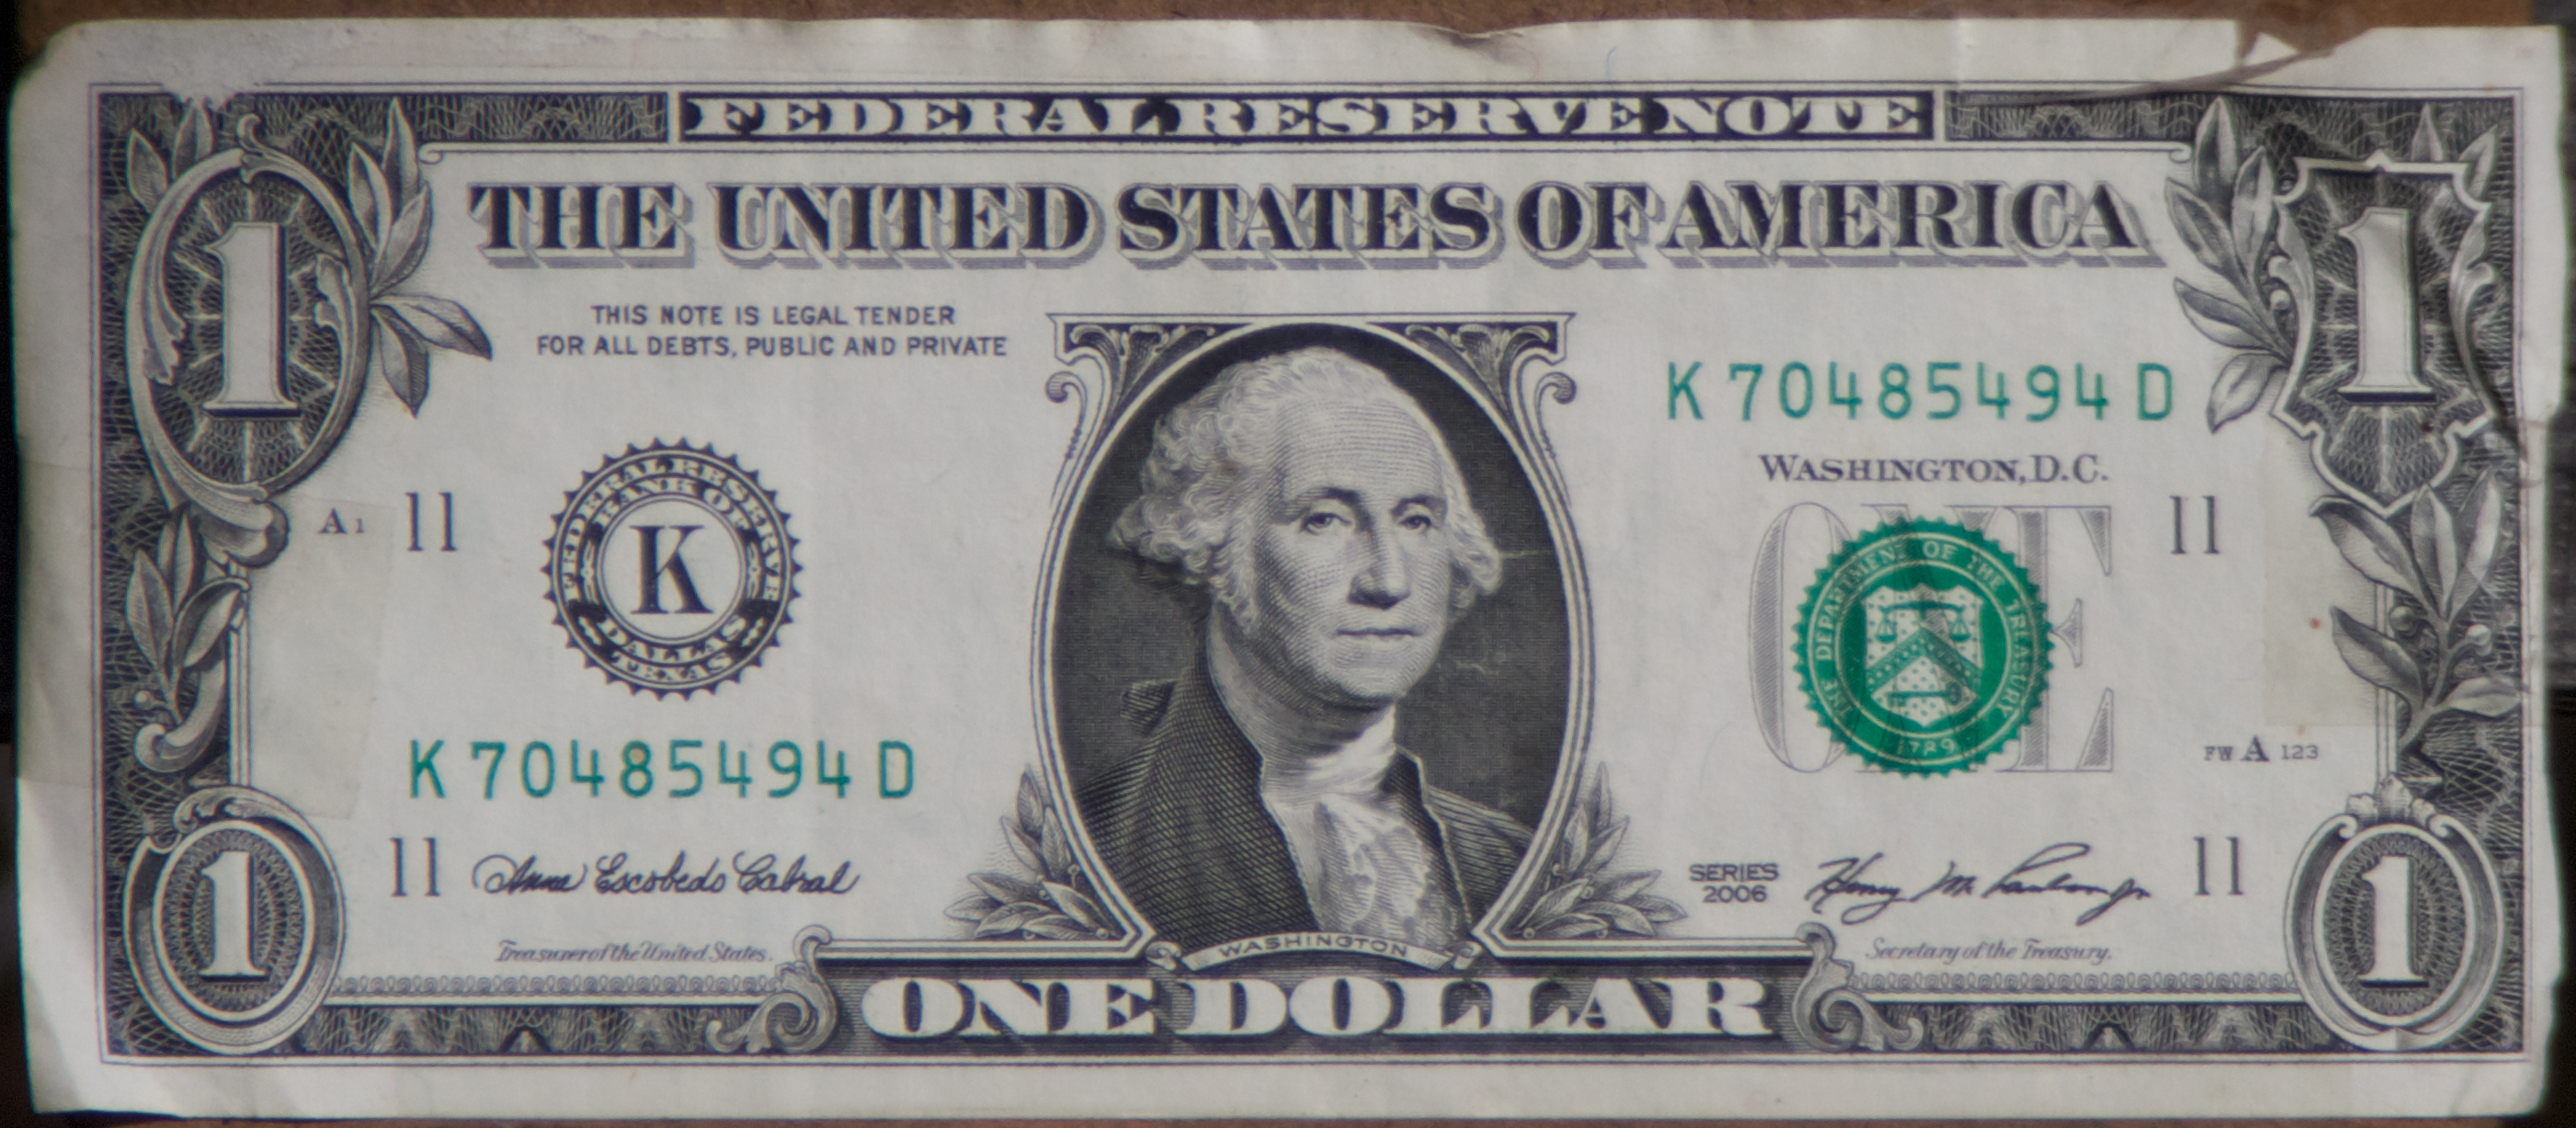 Swarovski atx modular scope system review by michael diane porter of a dollar bill 1betcityfo Images